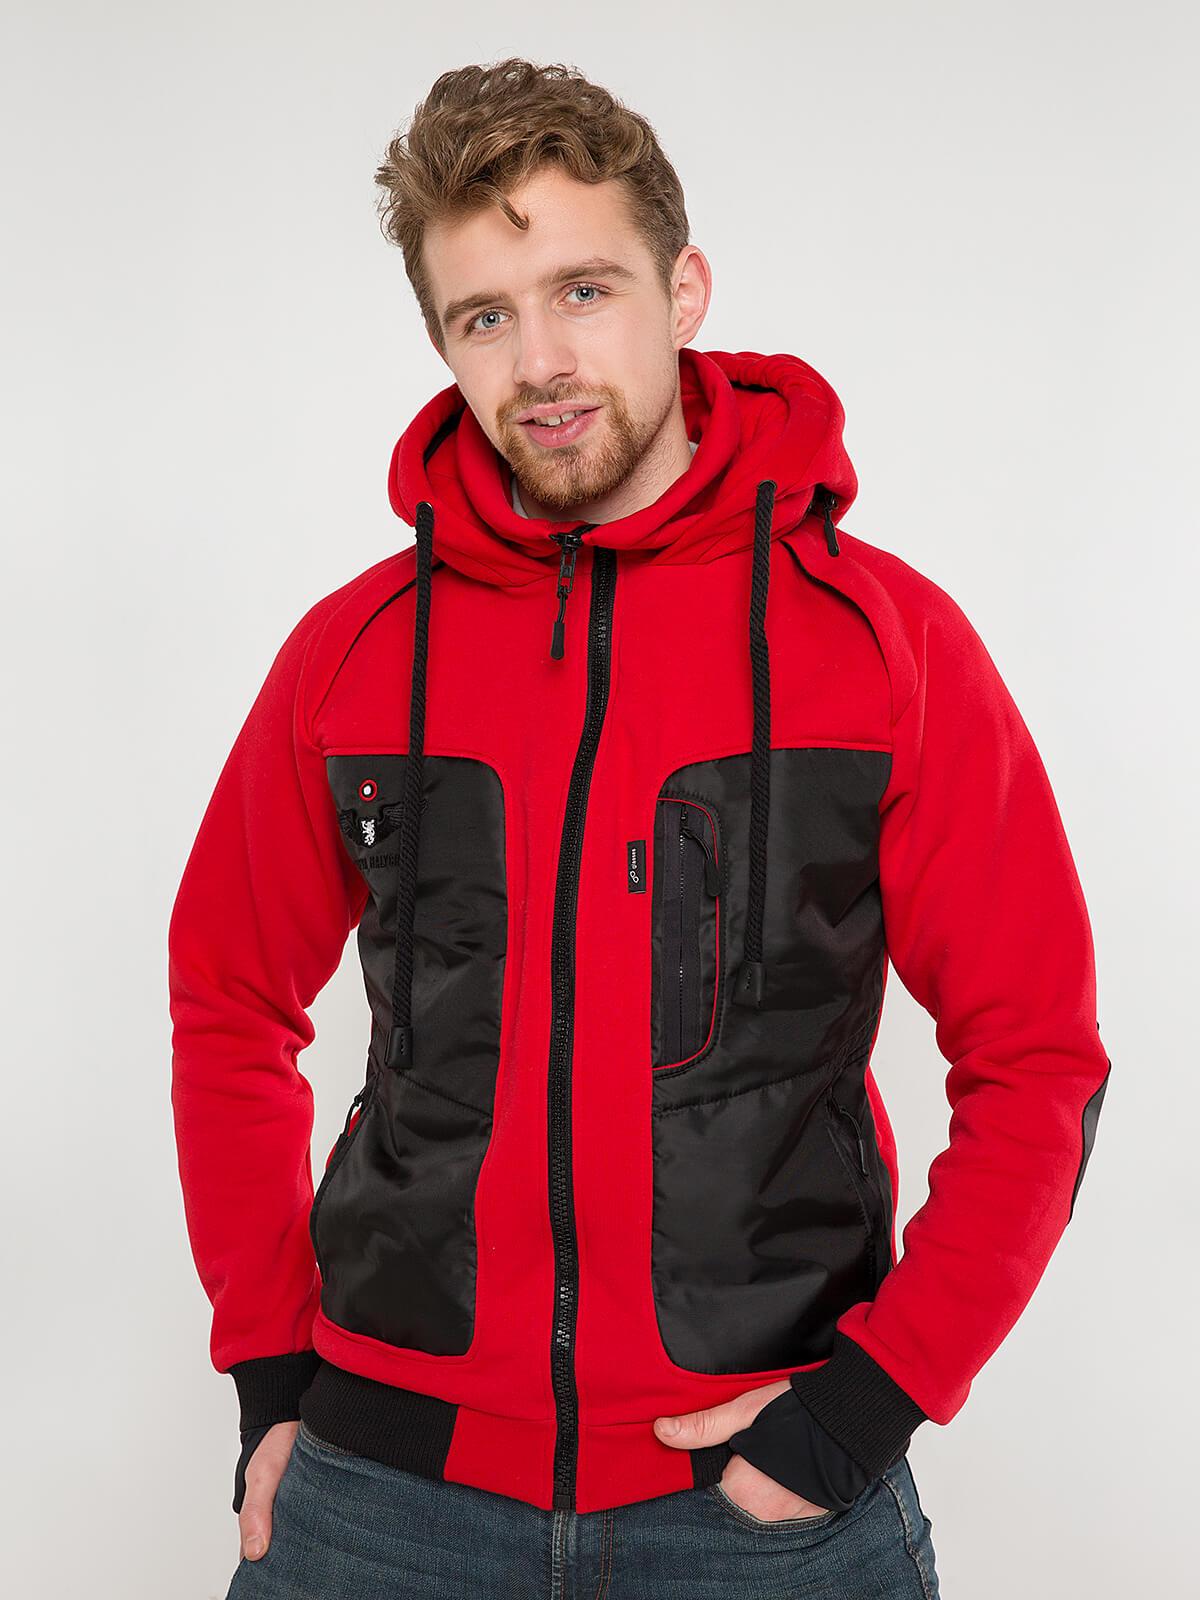 Men's Hoodie Syla. Color red. Unisex hoodie (men's sizes).